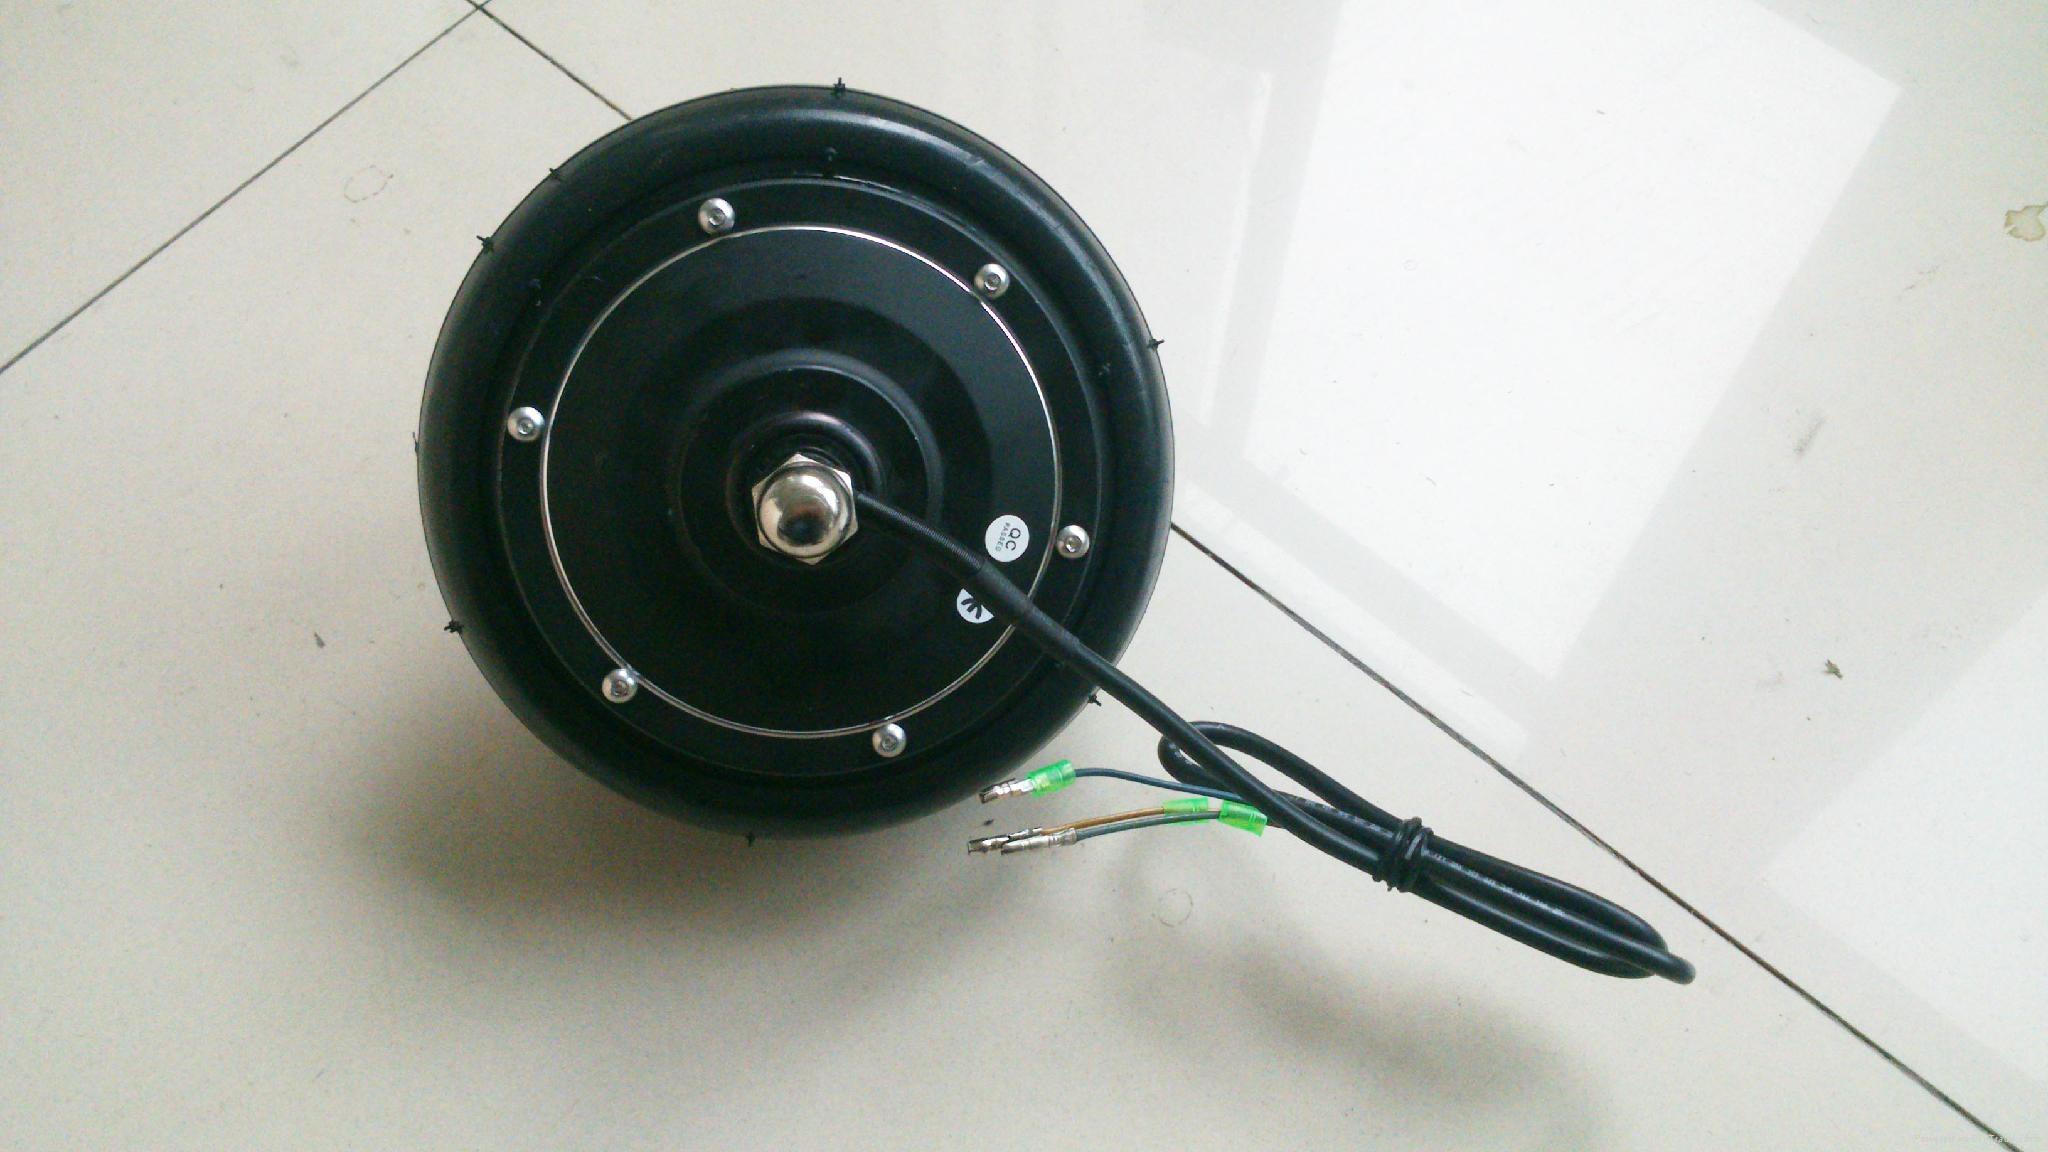 6 Inch Brushless Gearless Hub Motor Scooter Motor Lijiu